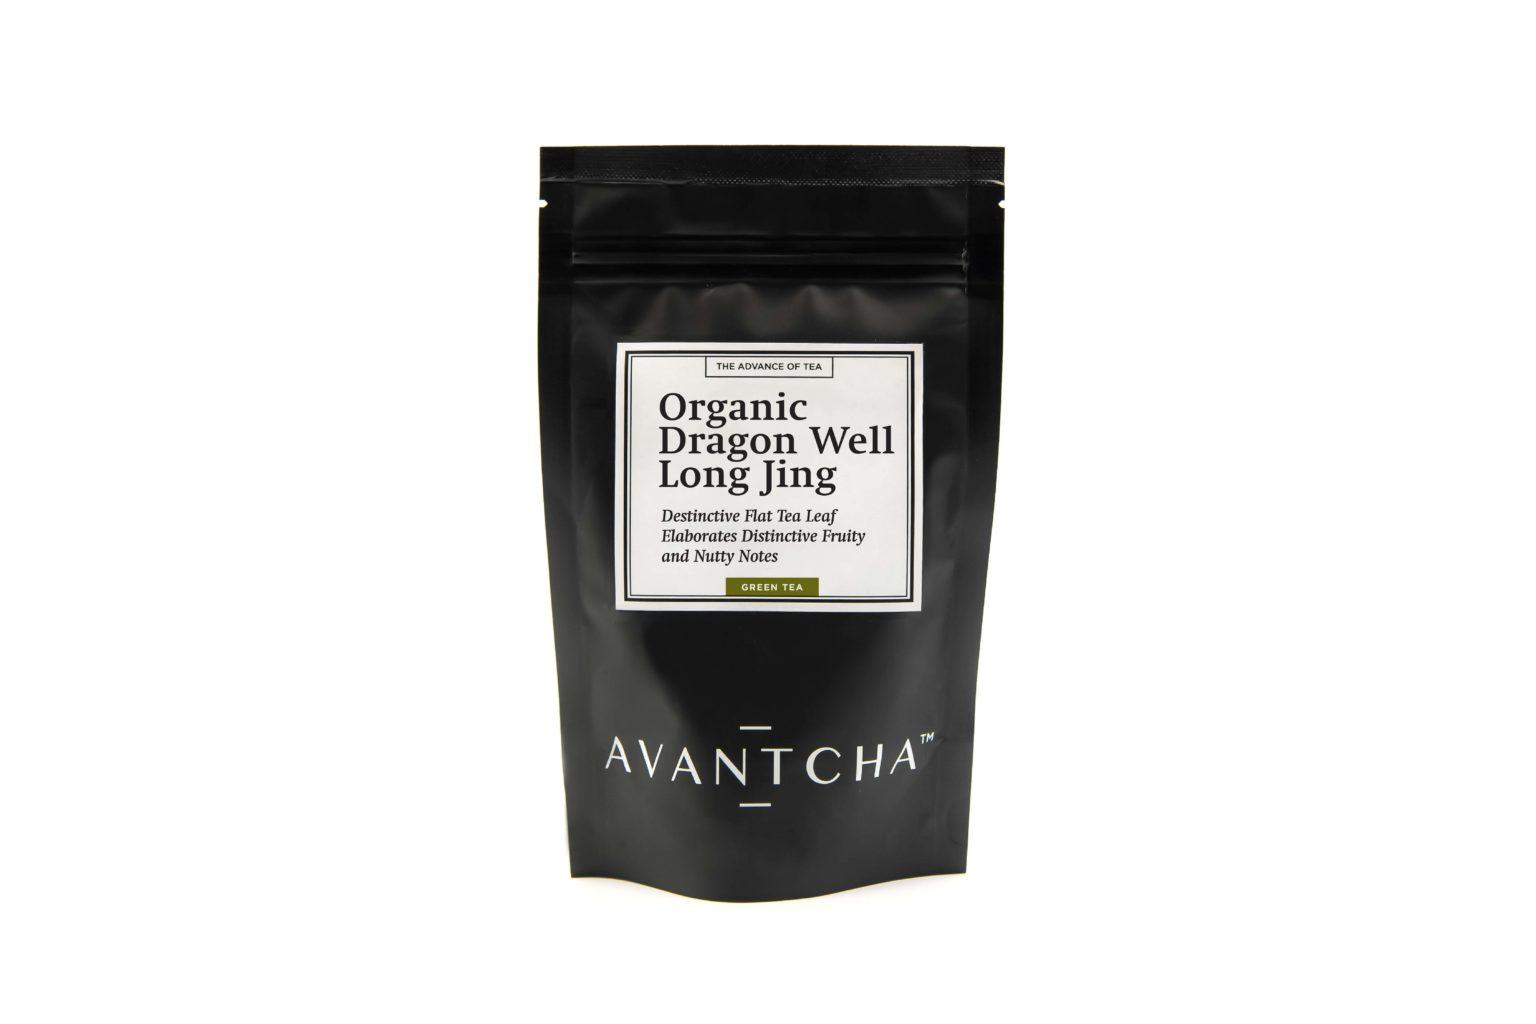 Organic Dragon Well Long Jing